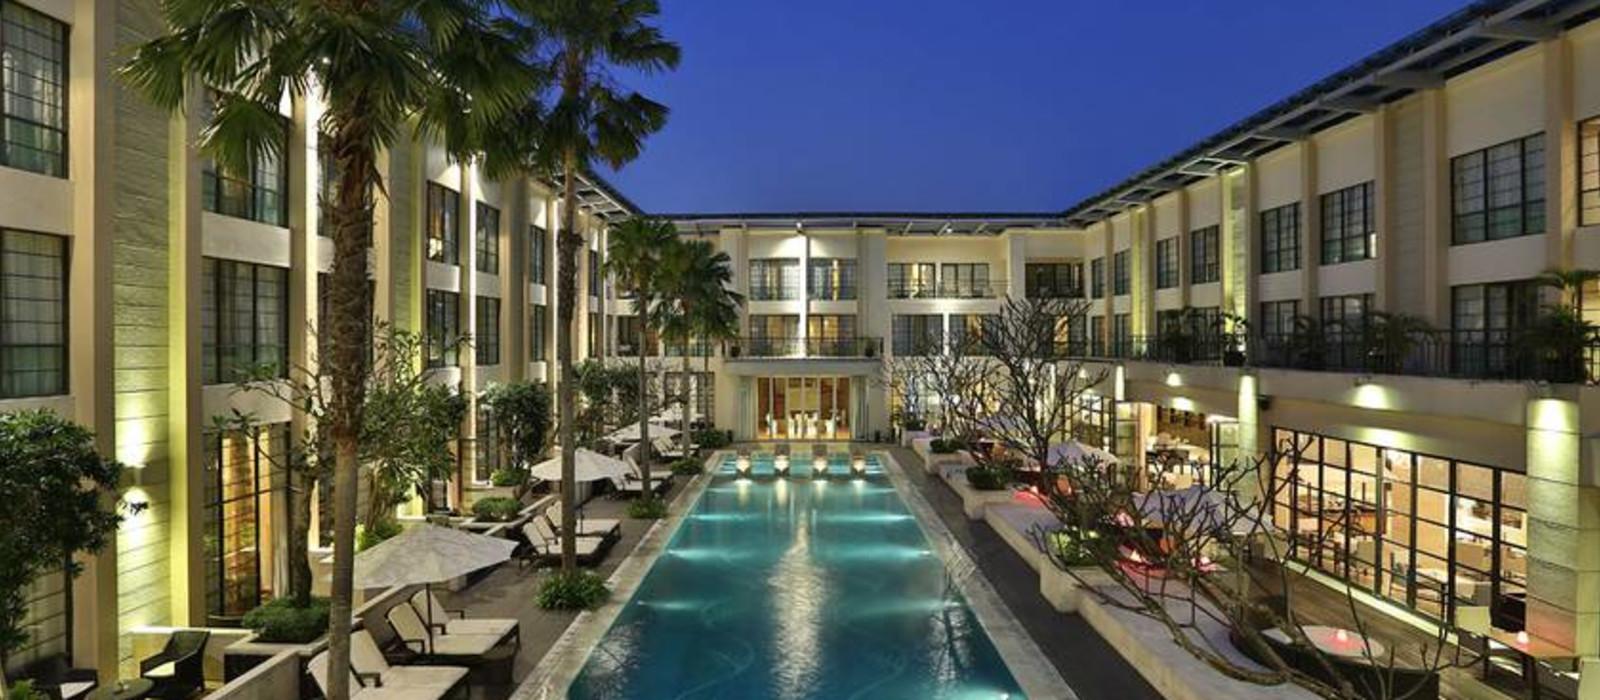 Hotel Aryaduta Medan Indonesien